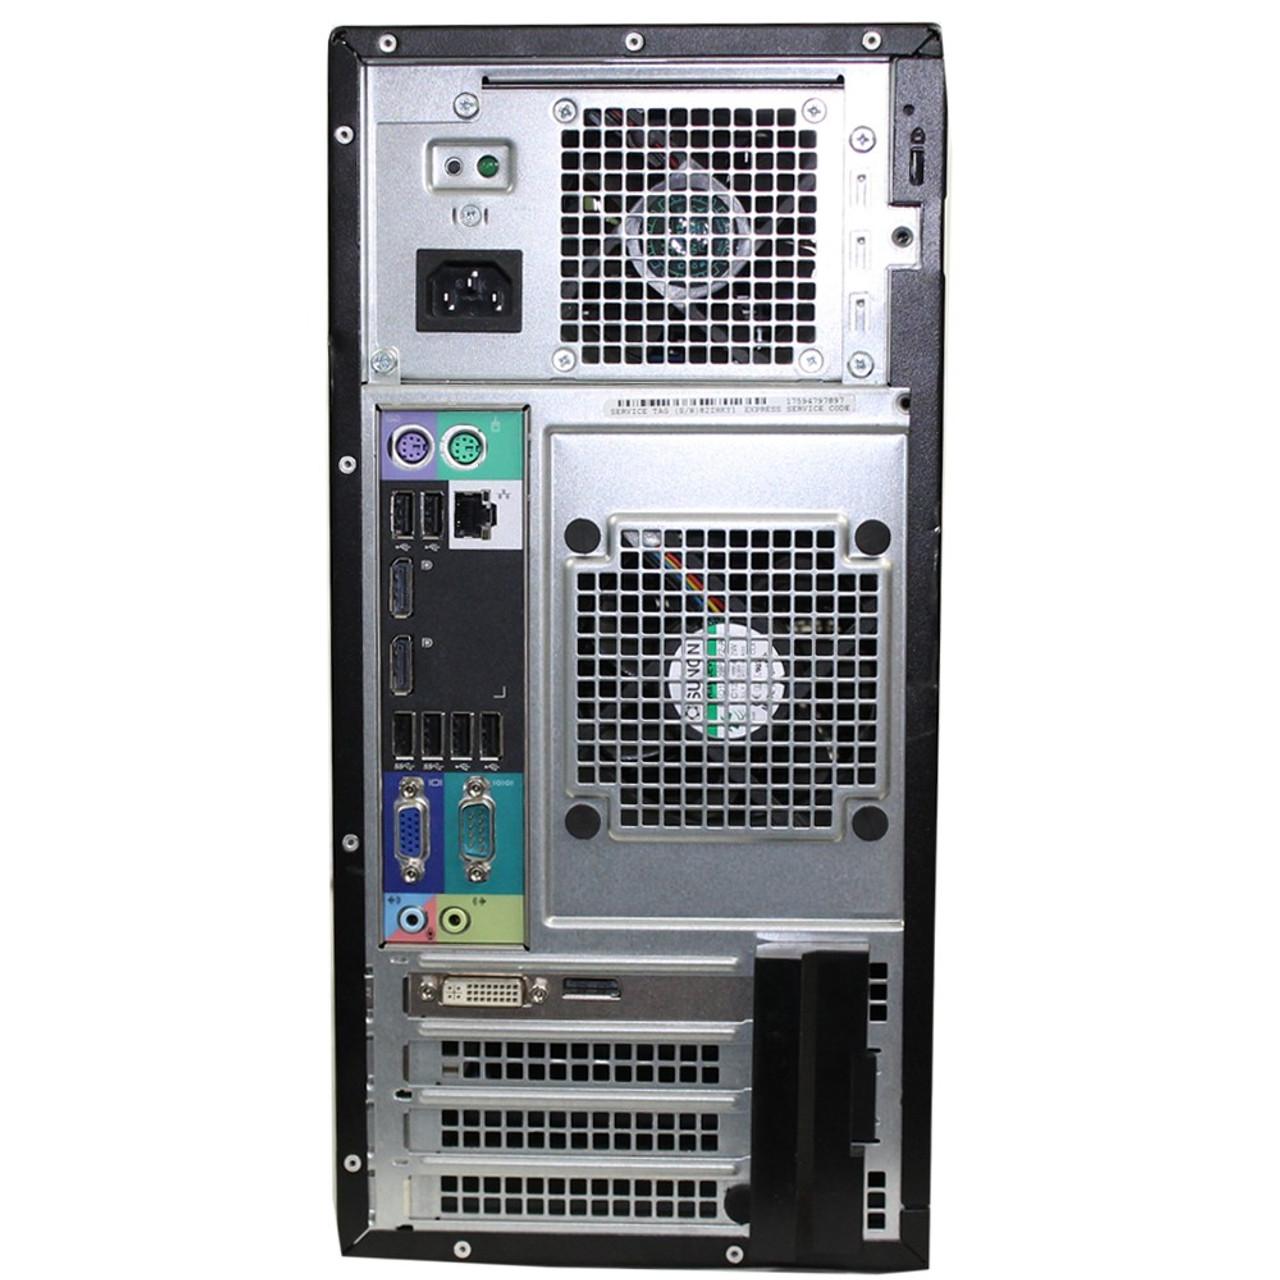 Dell Optiplex 7010 Tower Quad Core i7 3.40GHz, 8GB Ram, 500GB HDD, DVD-RW, Windows 10 Pro 64 Desktop Computer